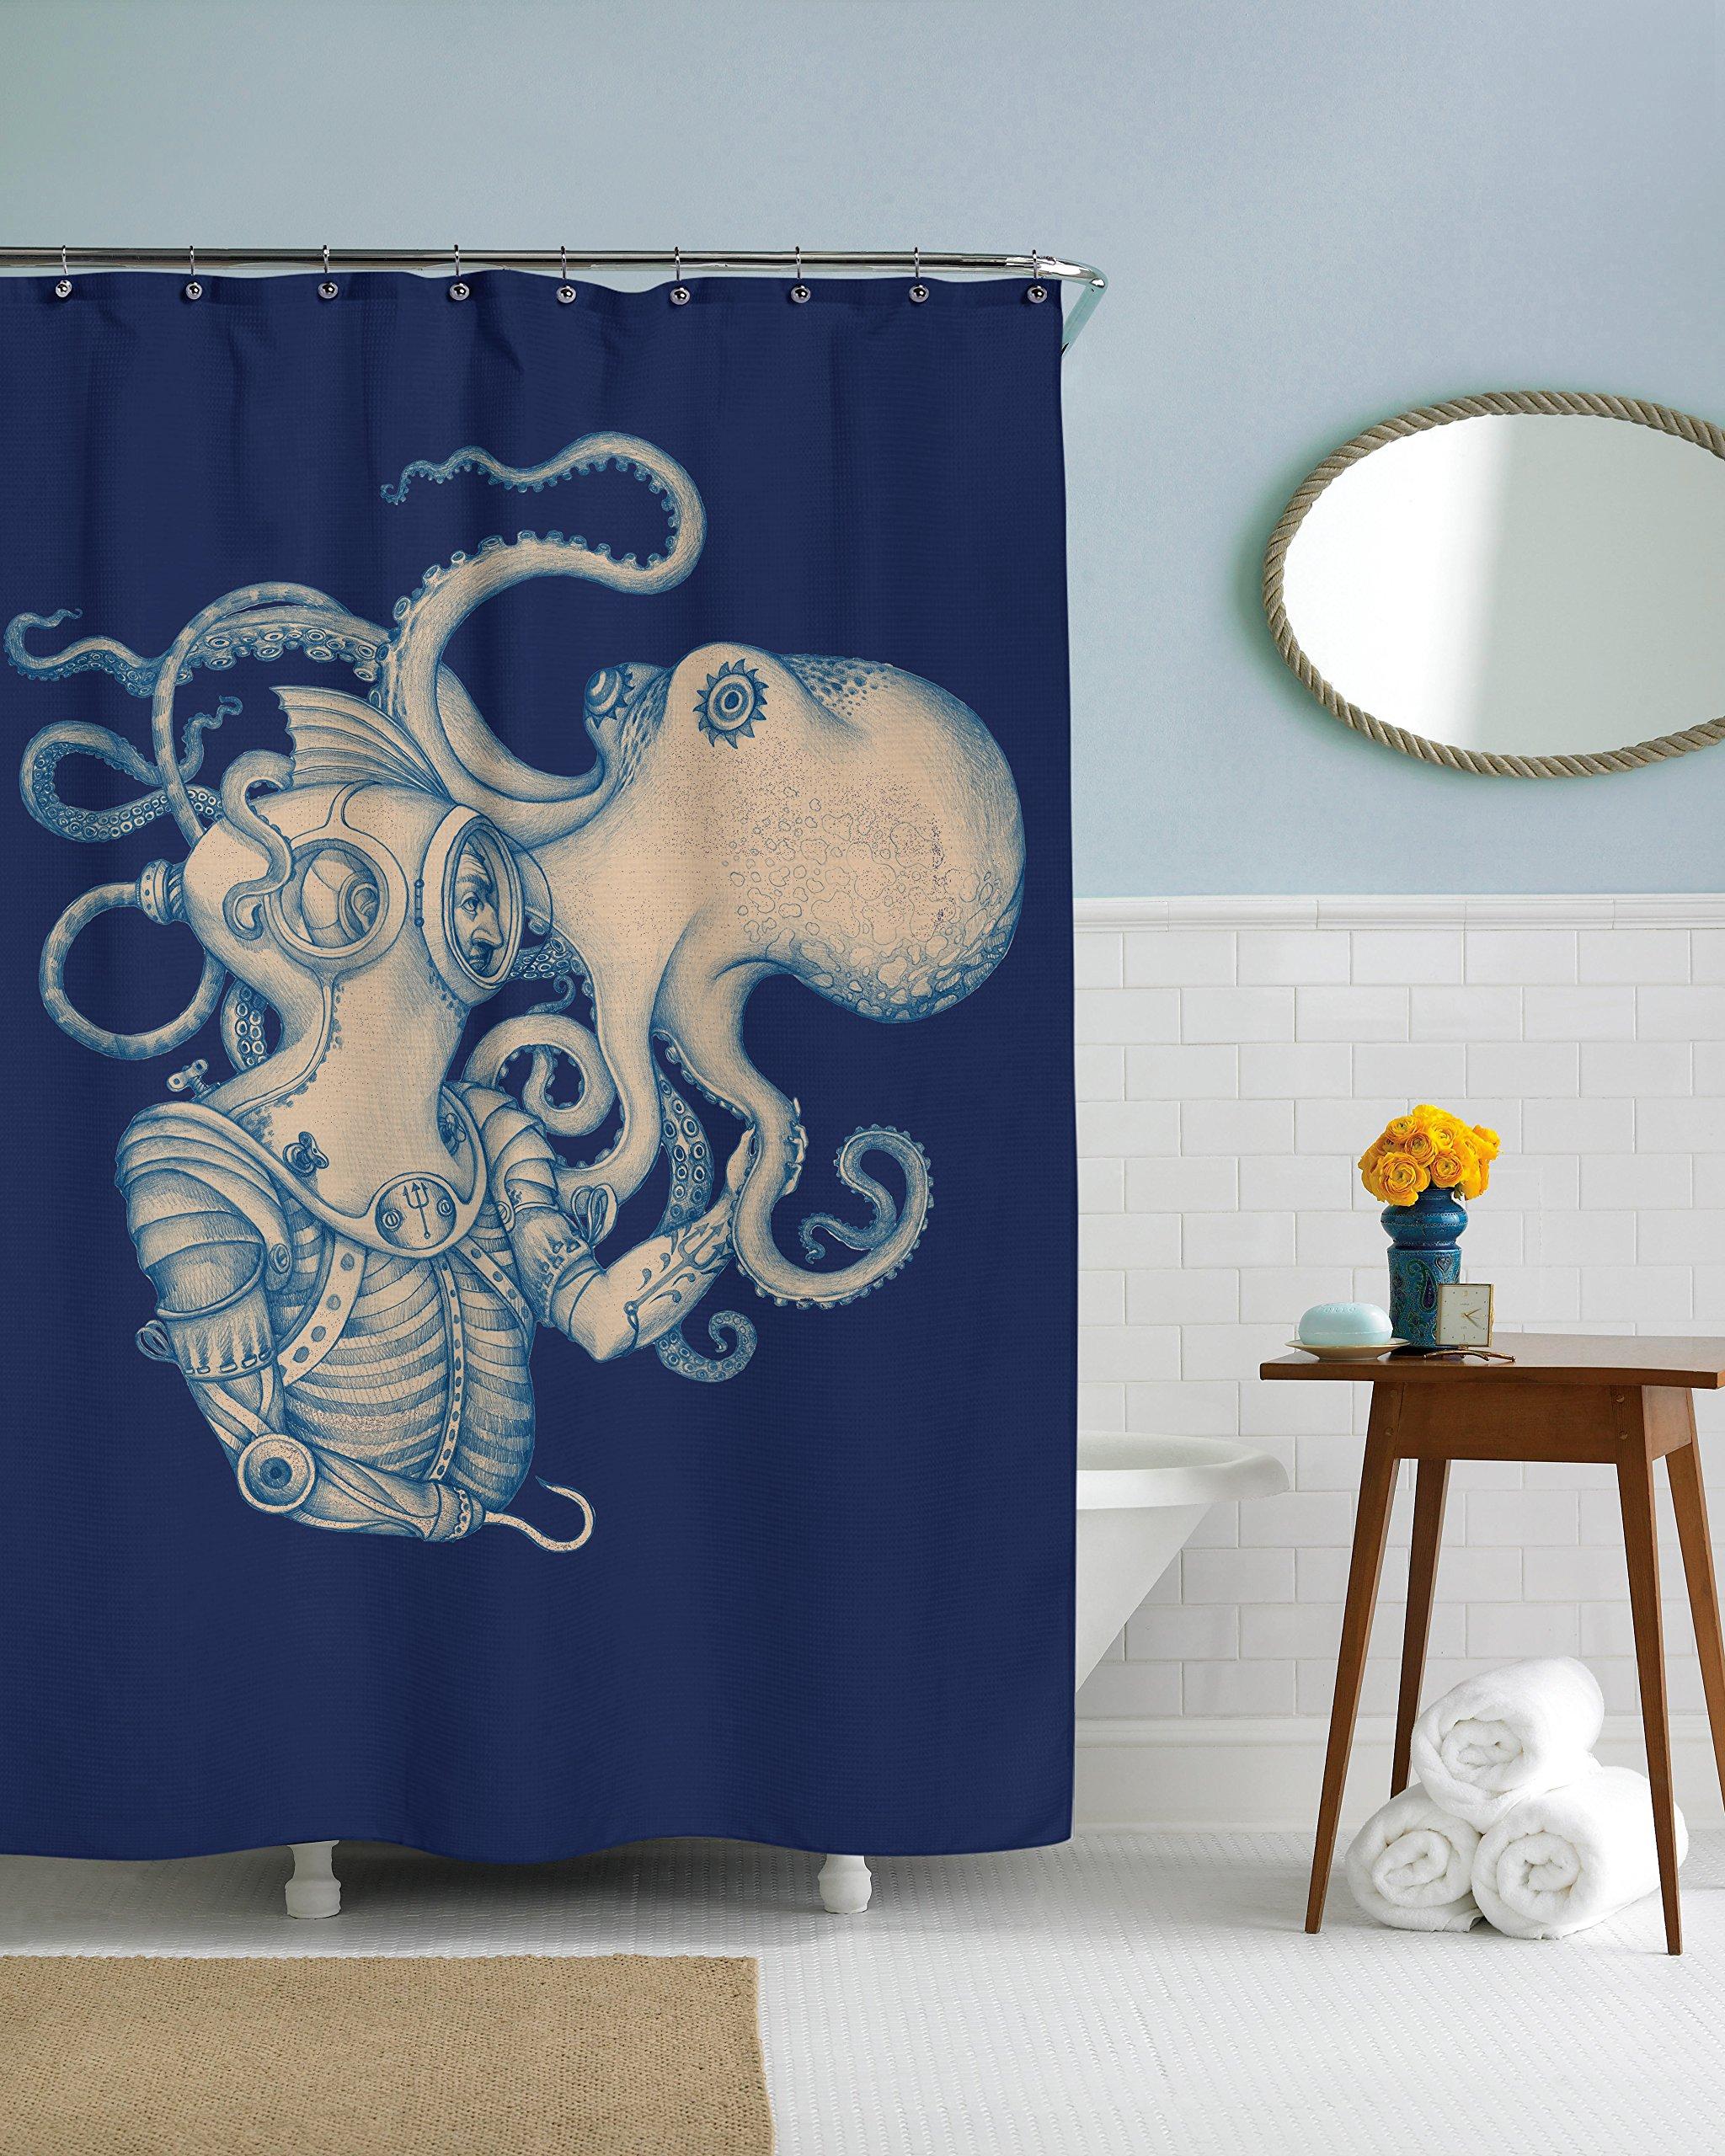 Sharp Shirter Octopus Shower Curtain Steampunk Nautical Decor Pirate Bathroom Theme Gold Kraken Waterproof Fabric 72x72 5